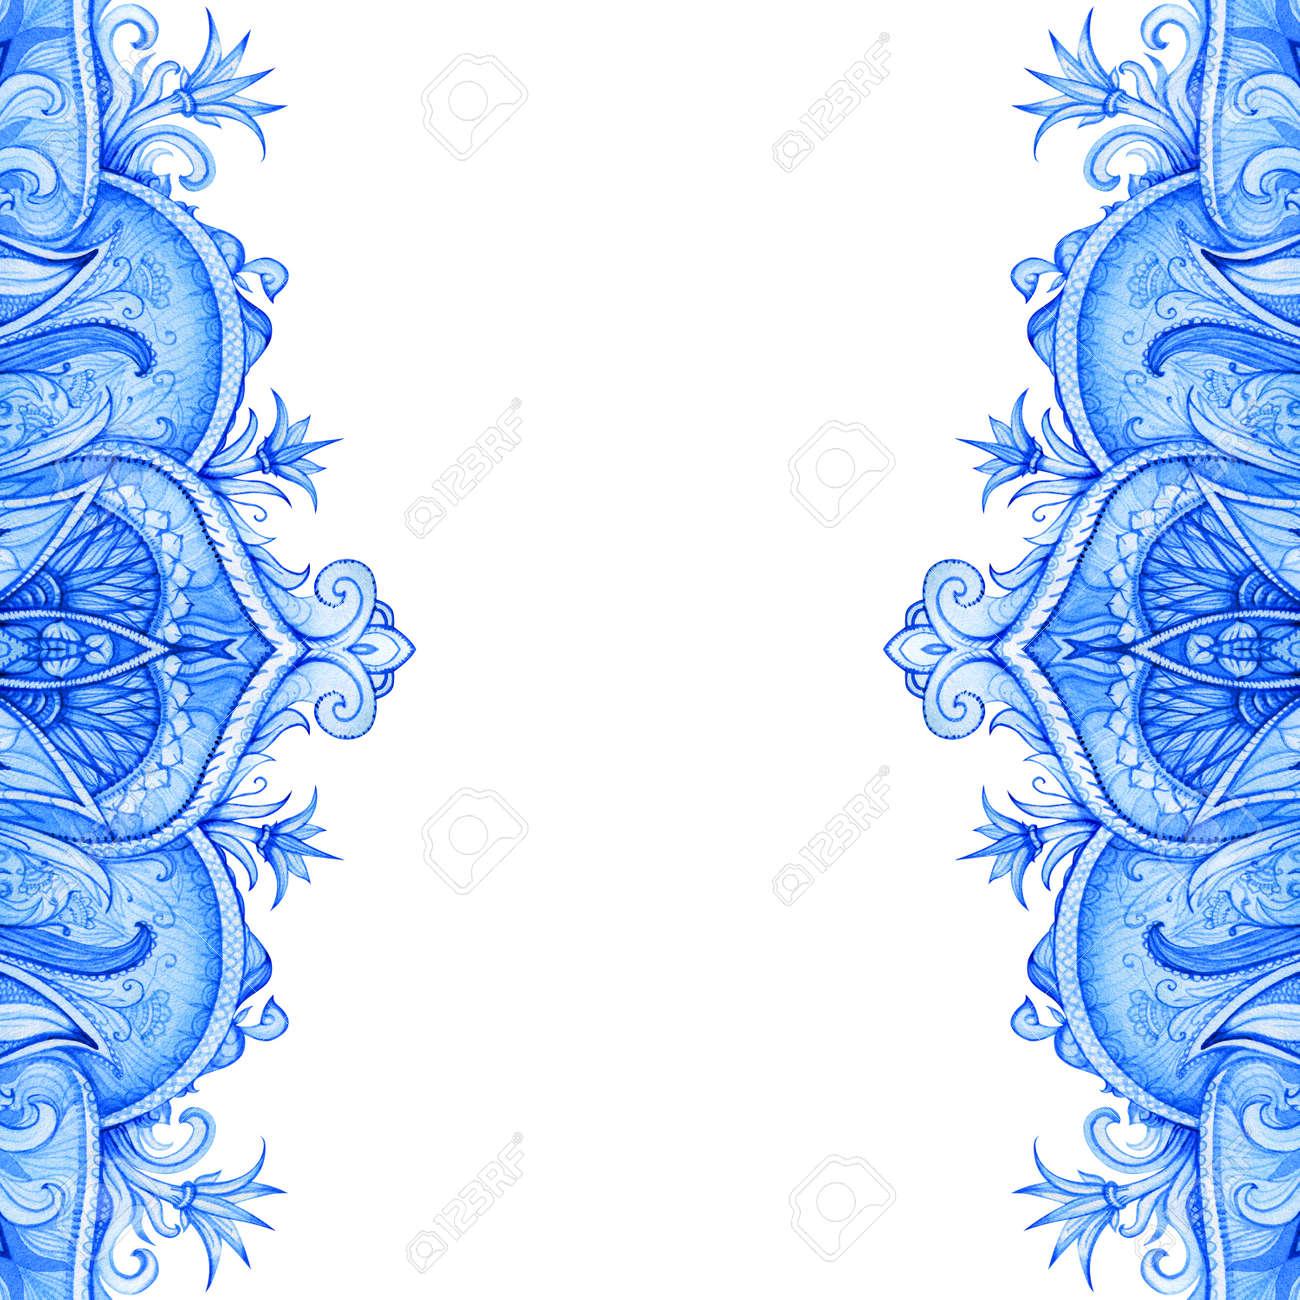 Seamless Pattern Retro Vintage Wedding Greeting Card Blue Background Or Invitation Decorative Elements Hand